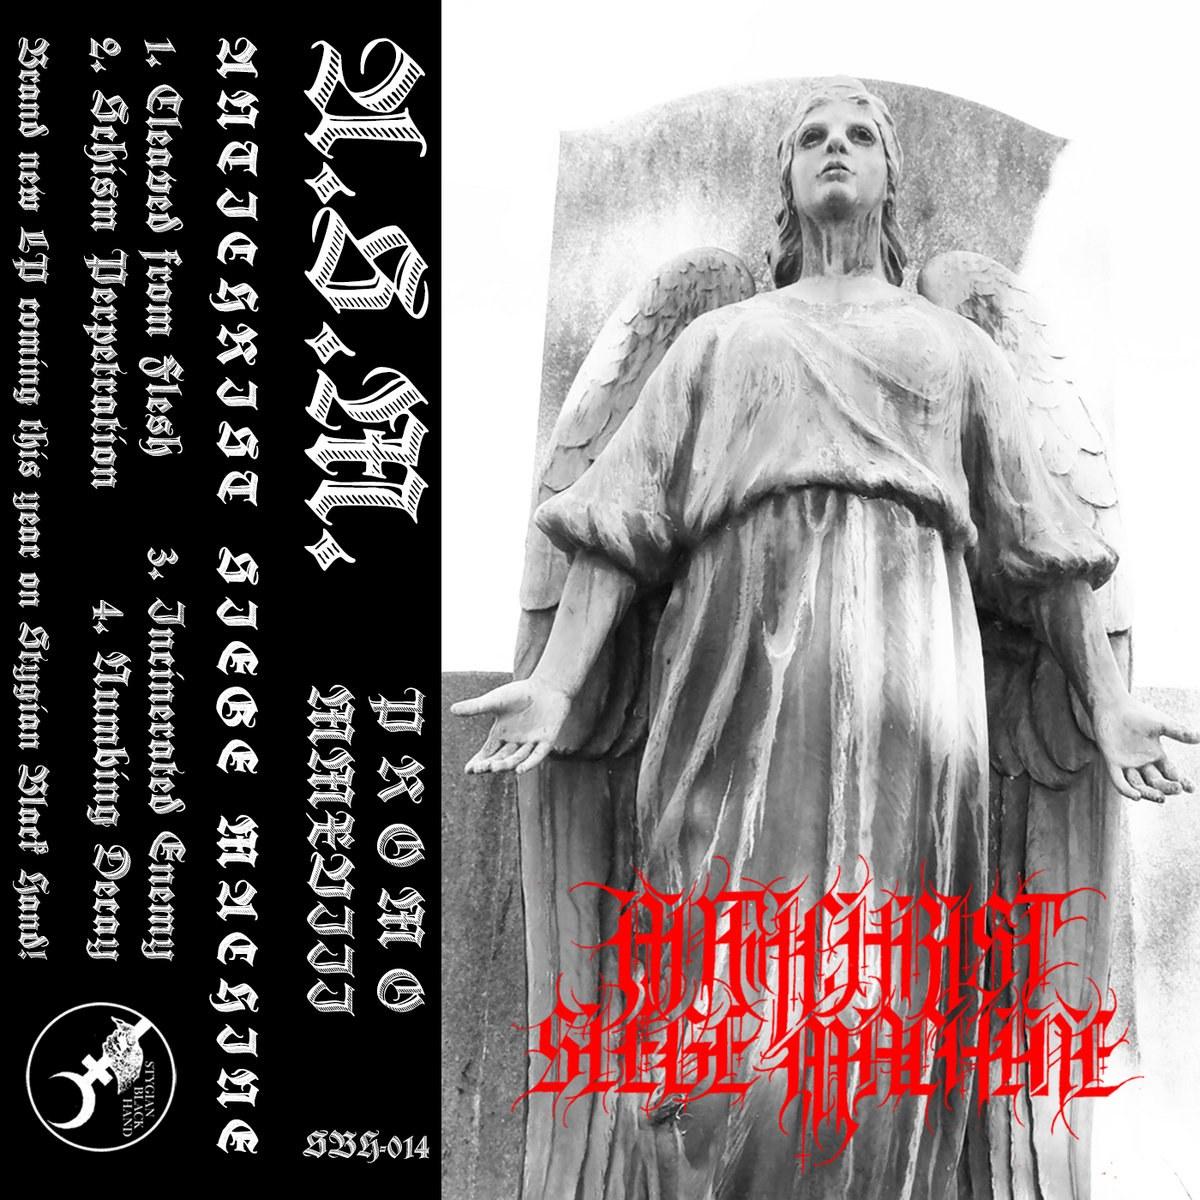 Review for Antichrist Siege Machine - Promo MMXVIII